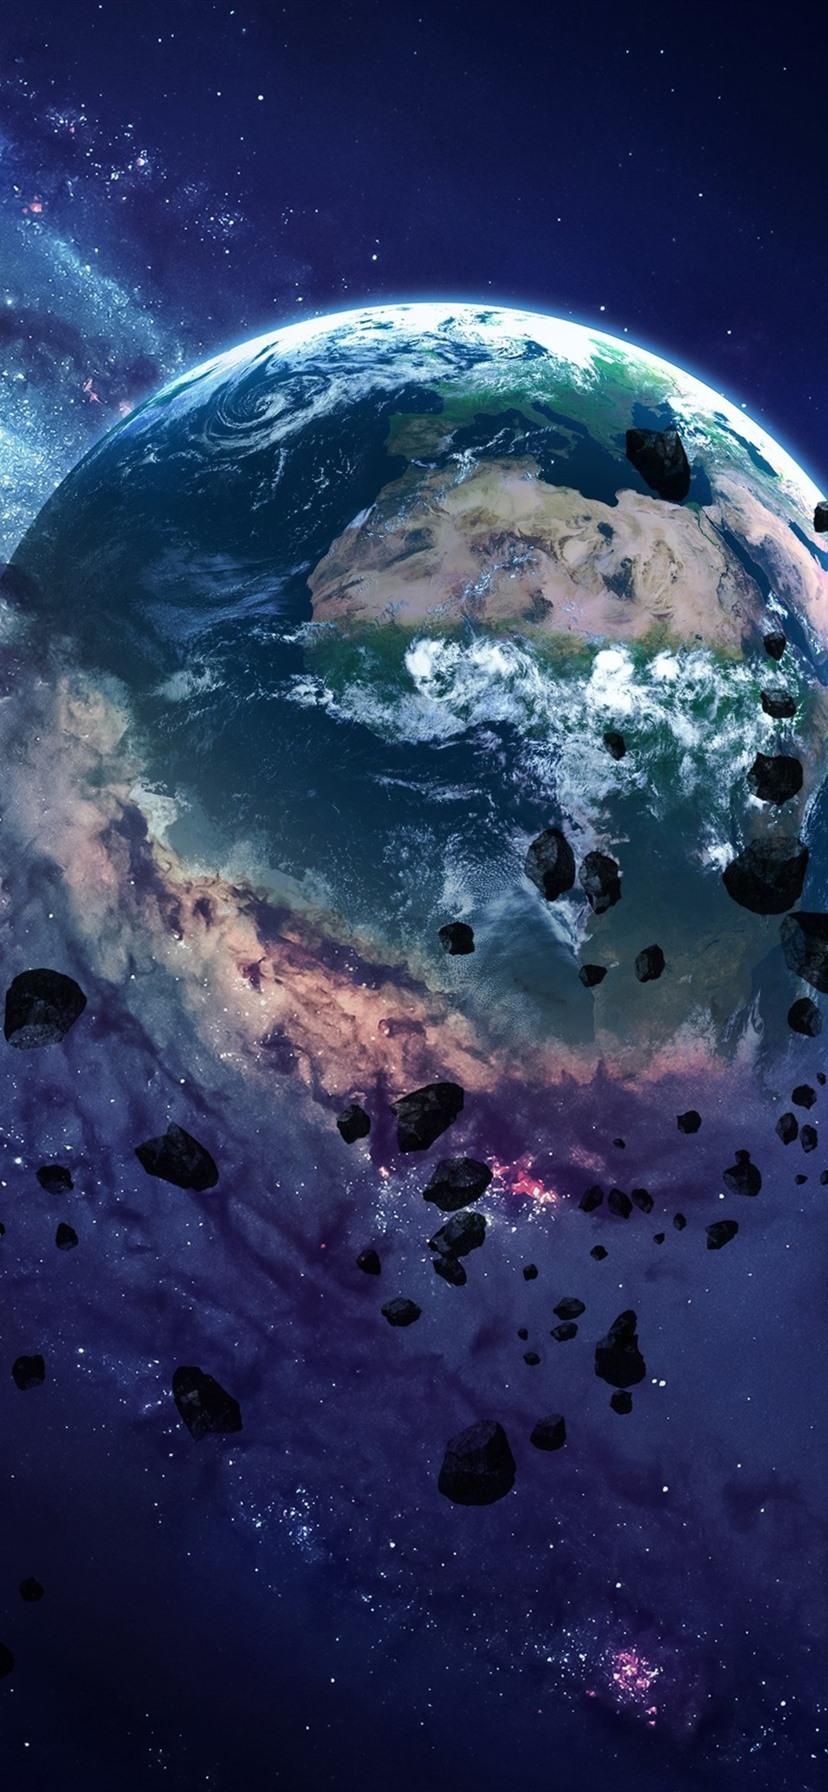 Wallpaper planet destruction rocks space 3840x2160 uhd - Space 4k phone wallpaper ...